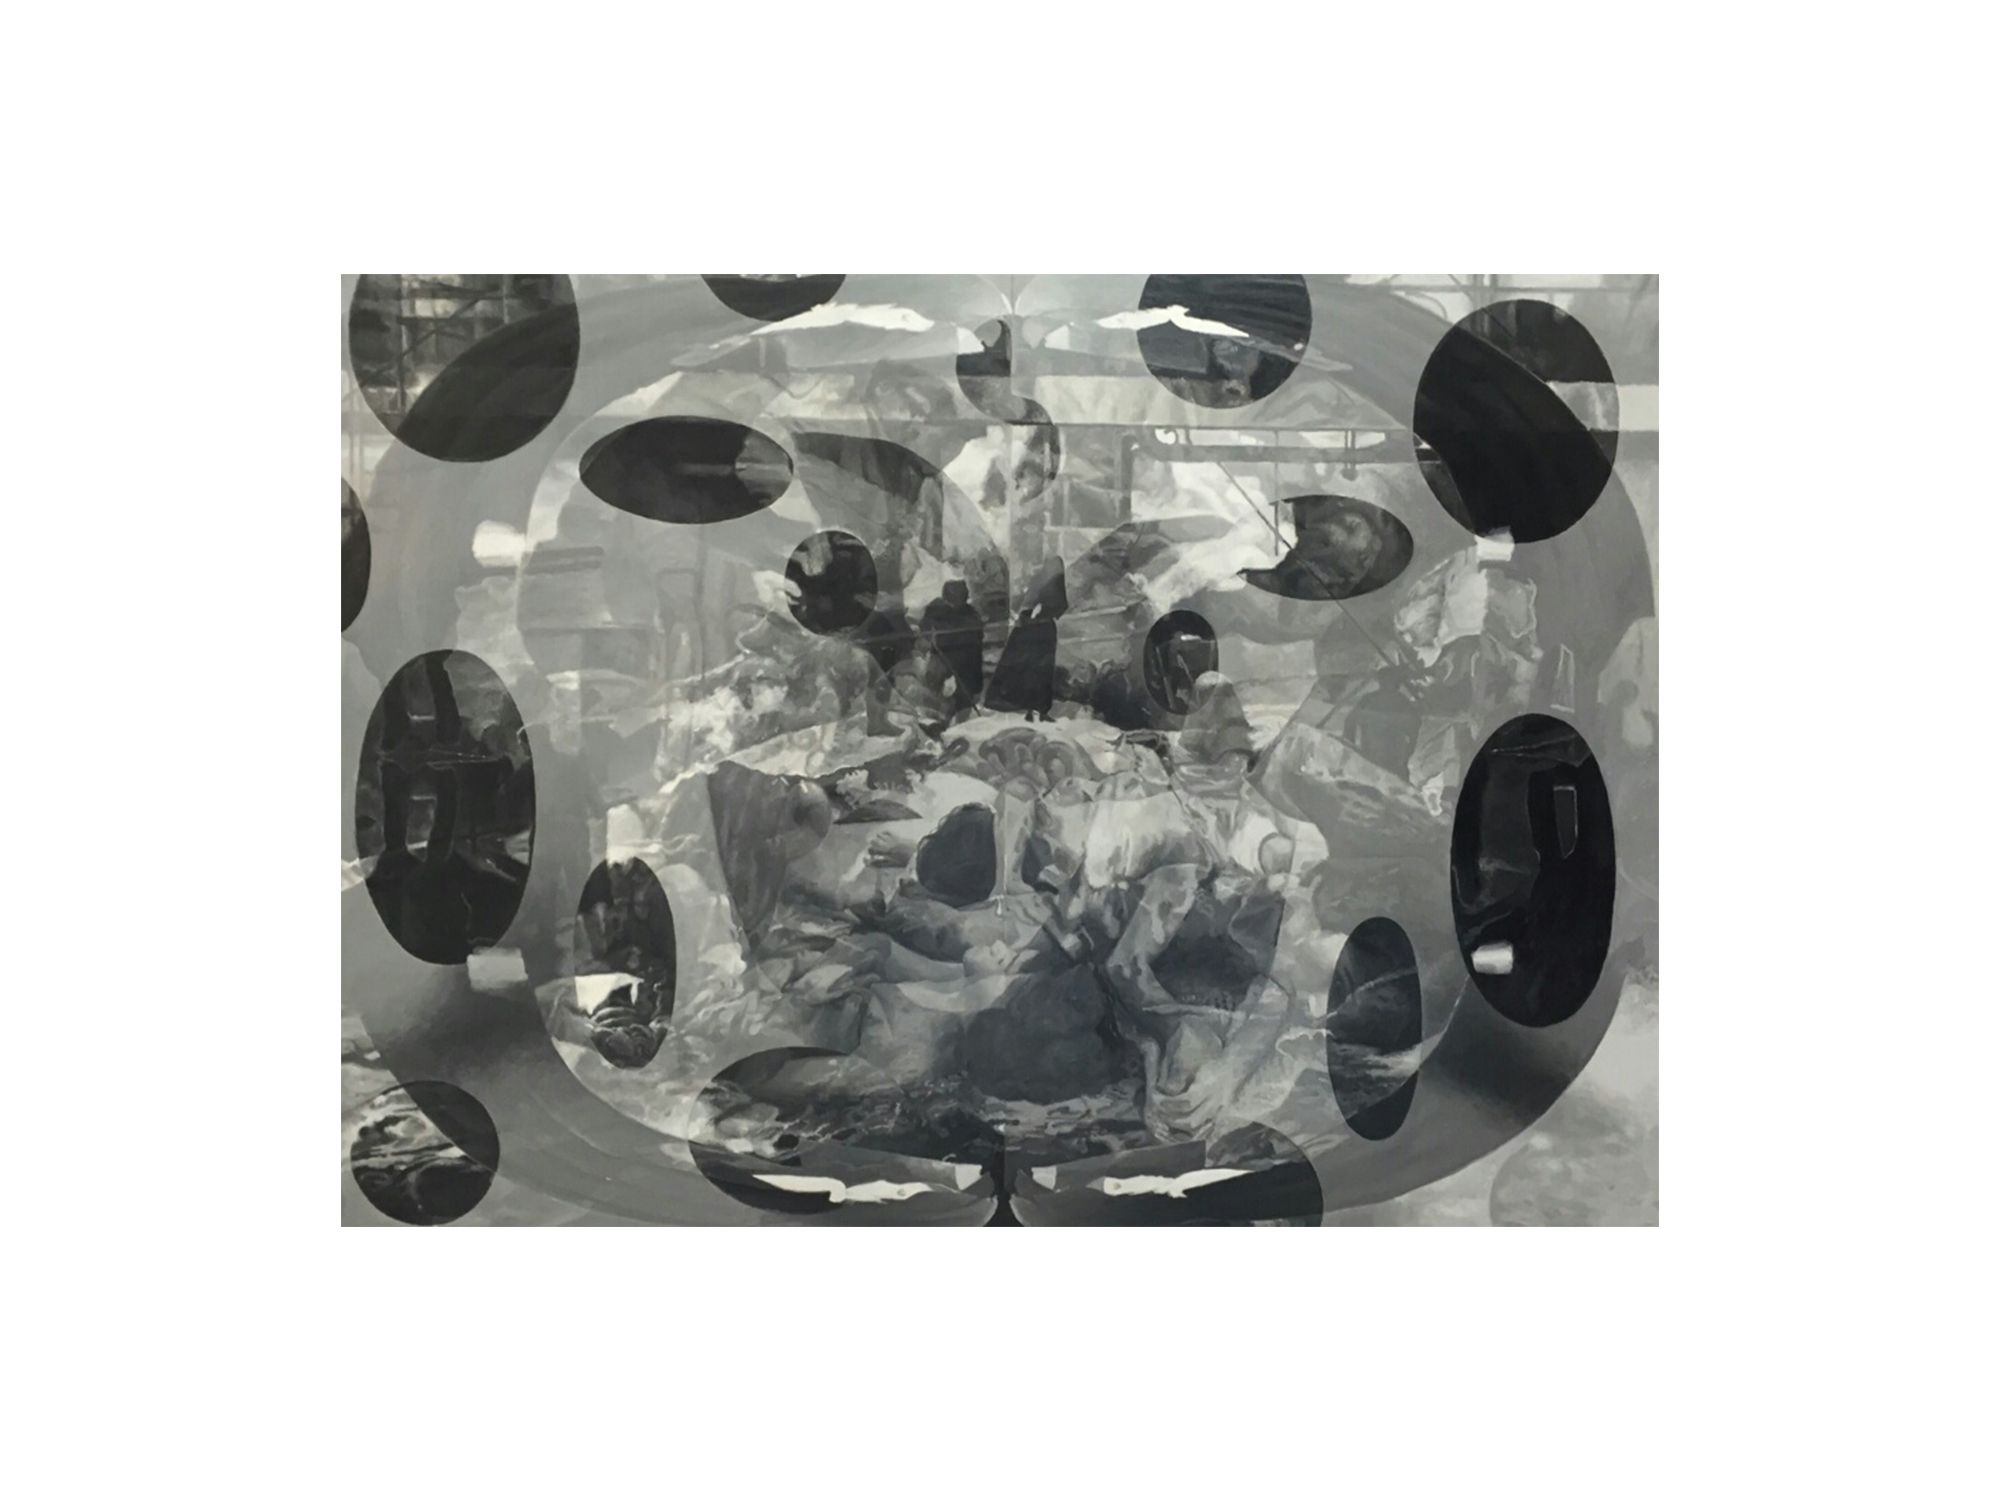 Julie Fragar    The Whaling II , 2016 oil on board 102 x 137cm   ARTIST BIO